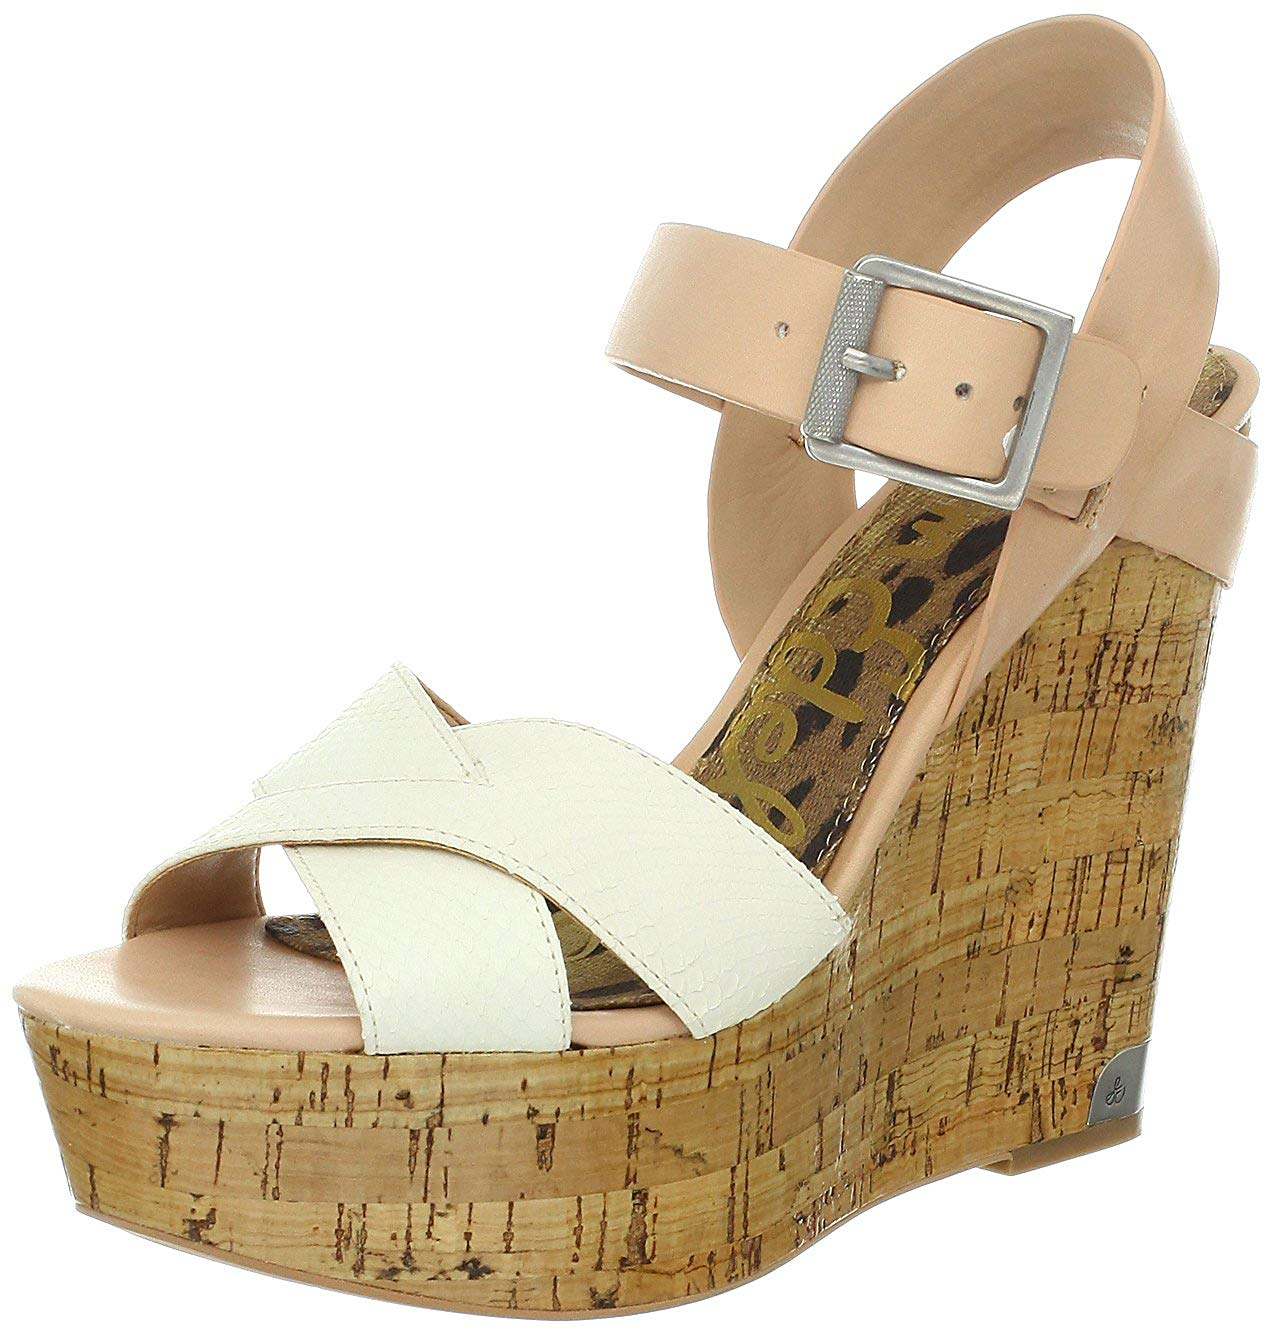 81780d811c7996 Buy Sam Edelman Javi Peep Toe Wedge Sandals Shoes Womens in Cheap ...